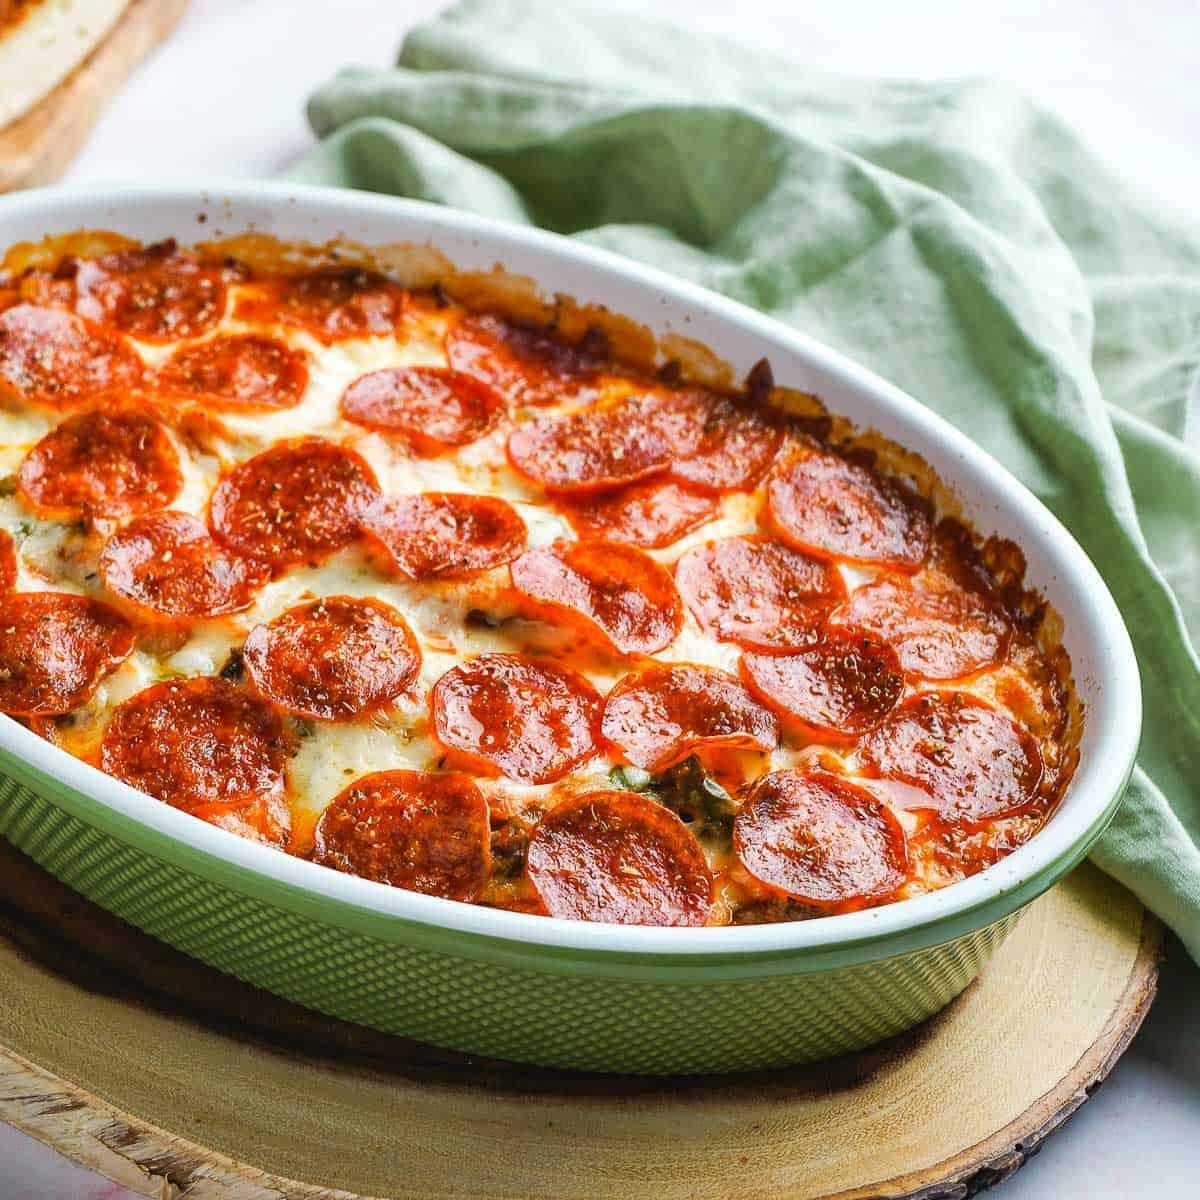 Pizza Chicken Casserole Close Up in Dish